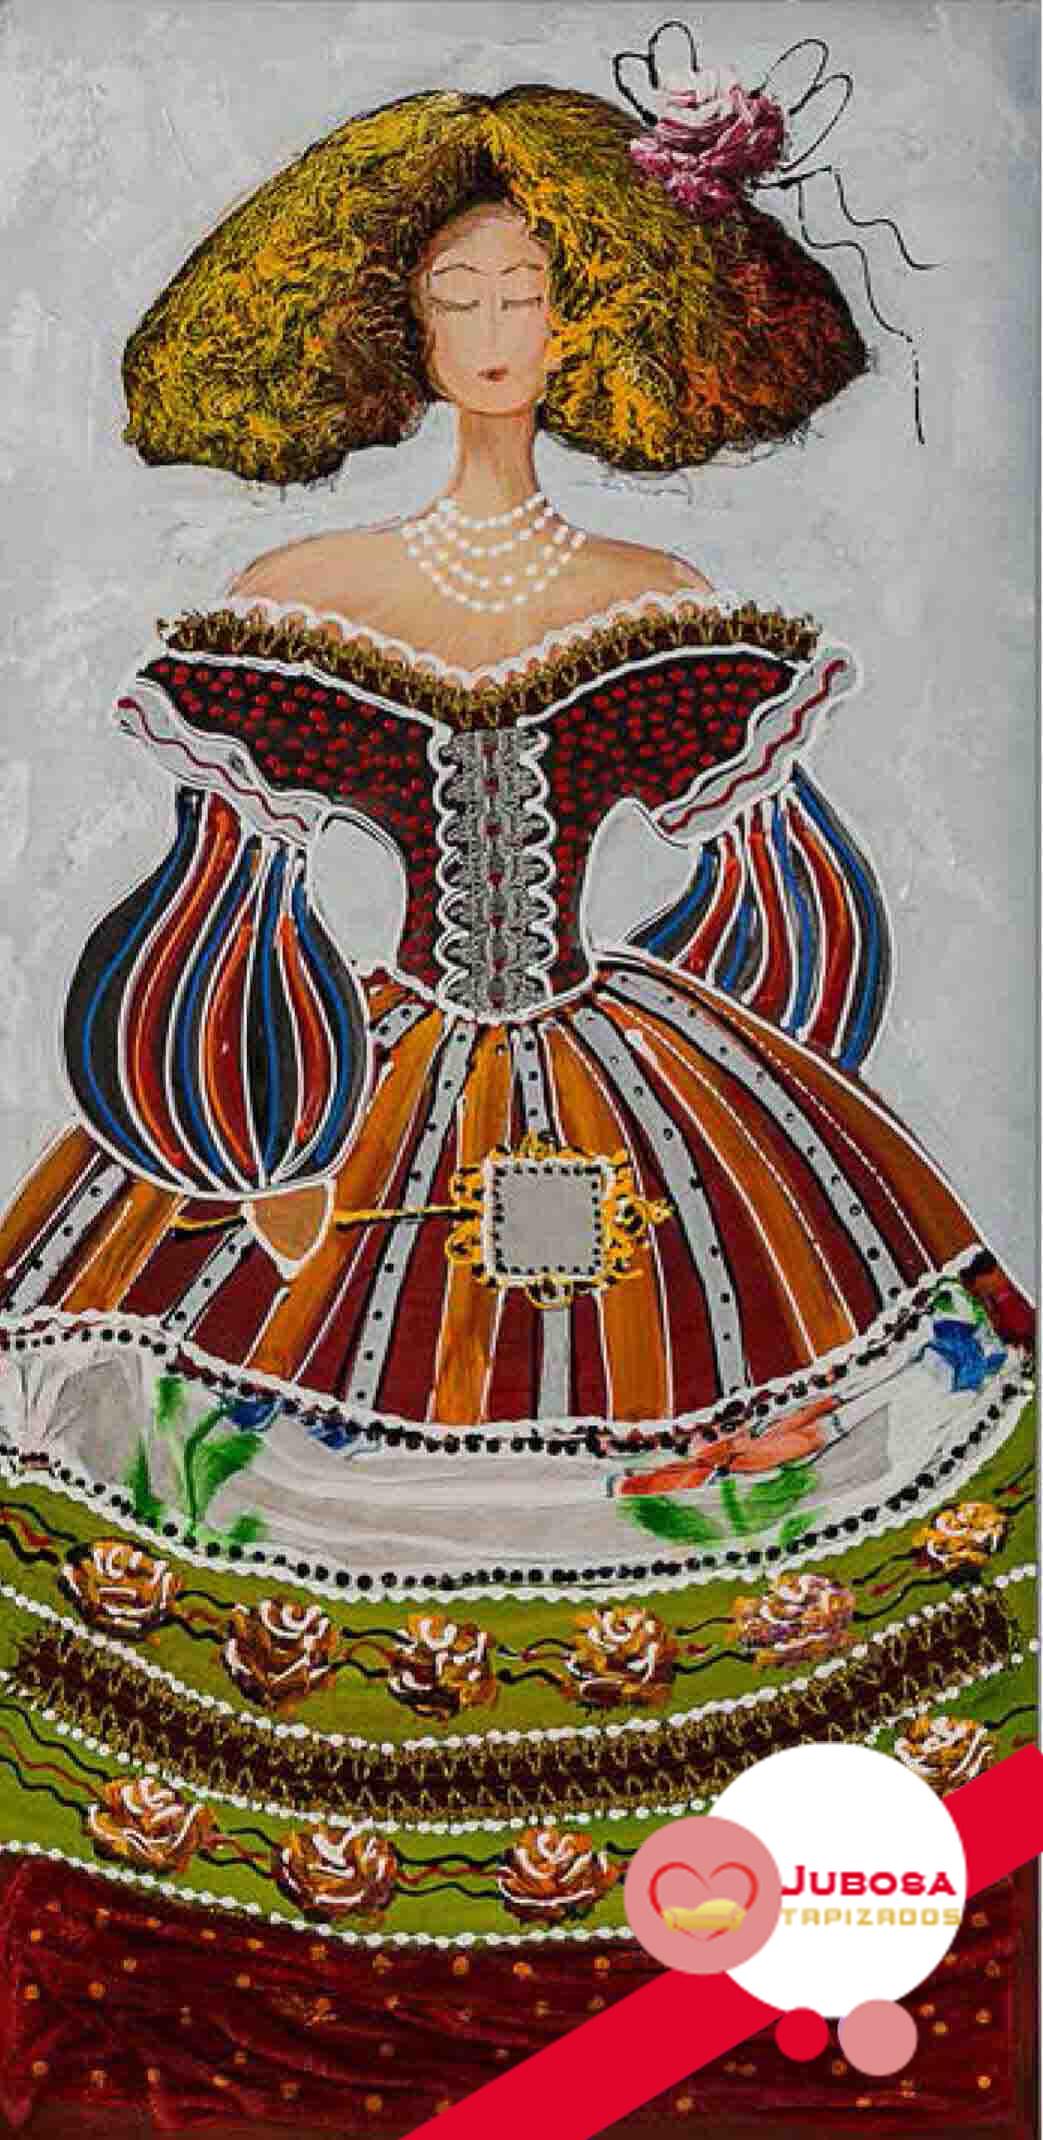 cuadro menina barita tapizados jubosa